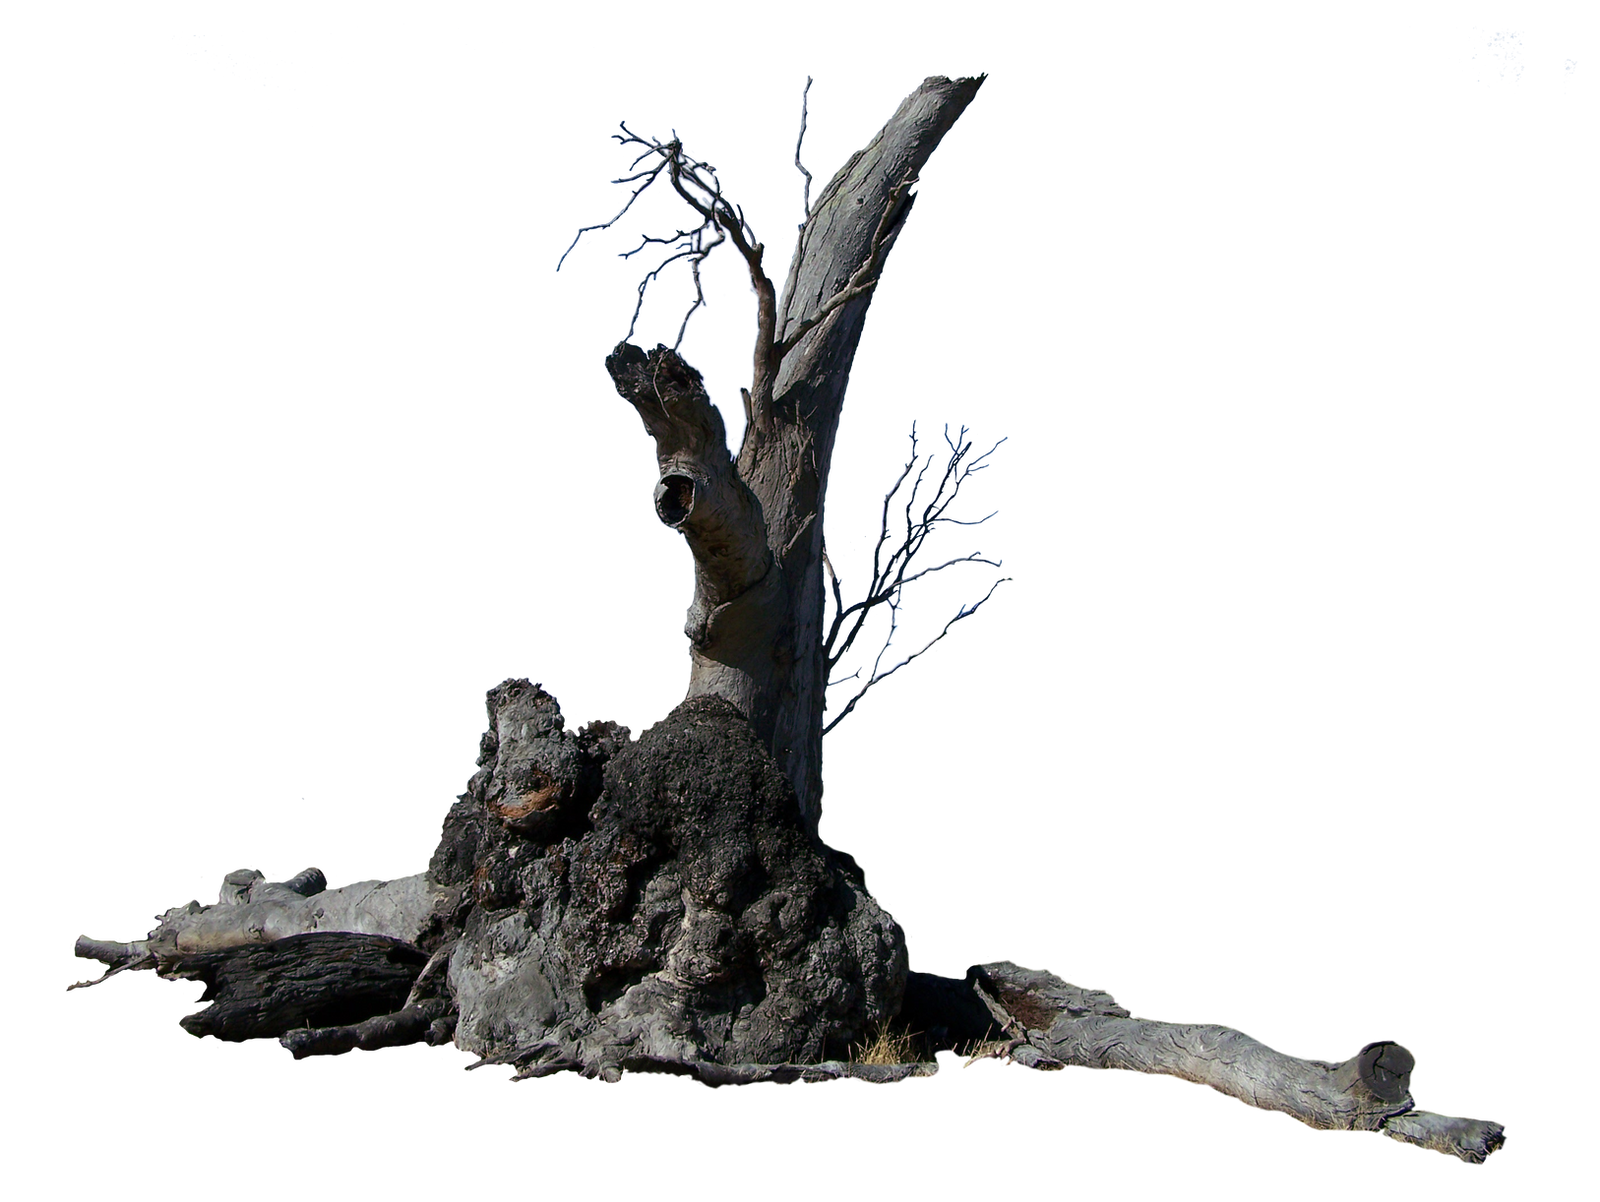 Lightning Tree Precut by Stockopedia